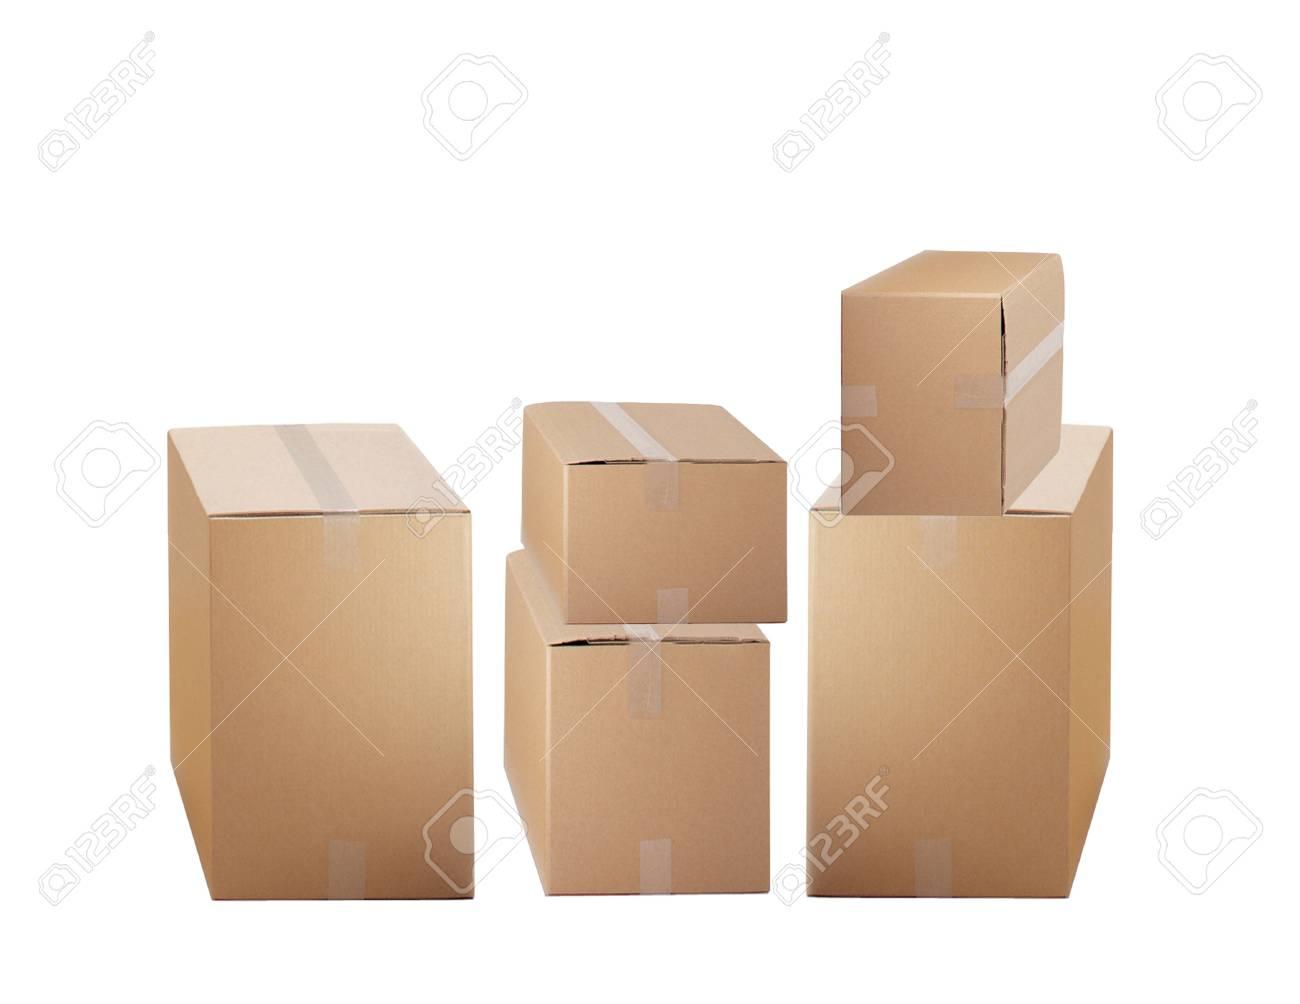 cardboard boxes isolated on white background Stock Photo - 21967463